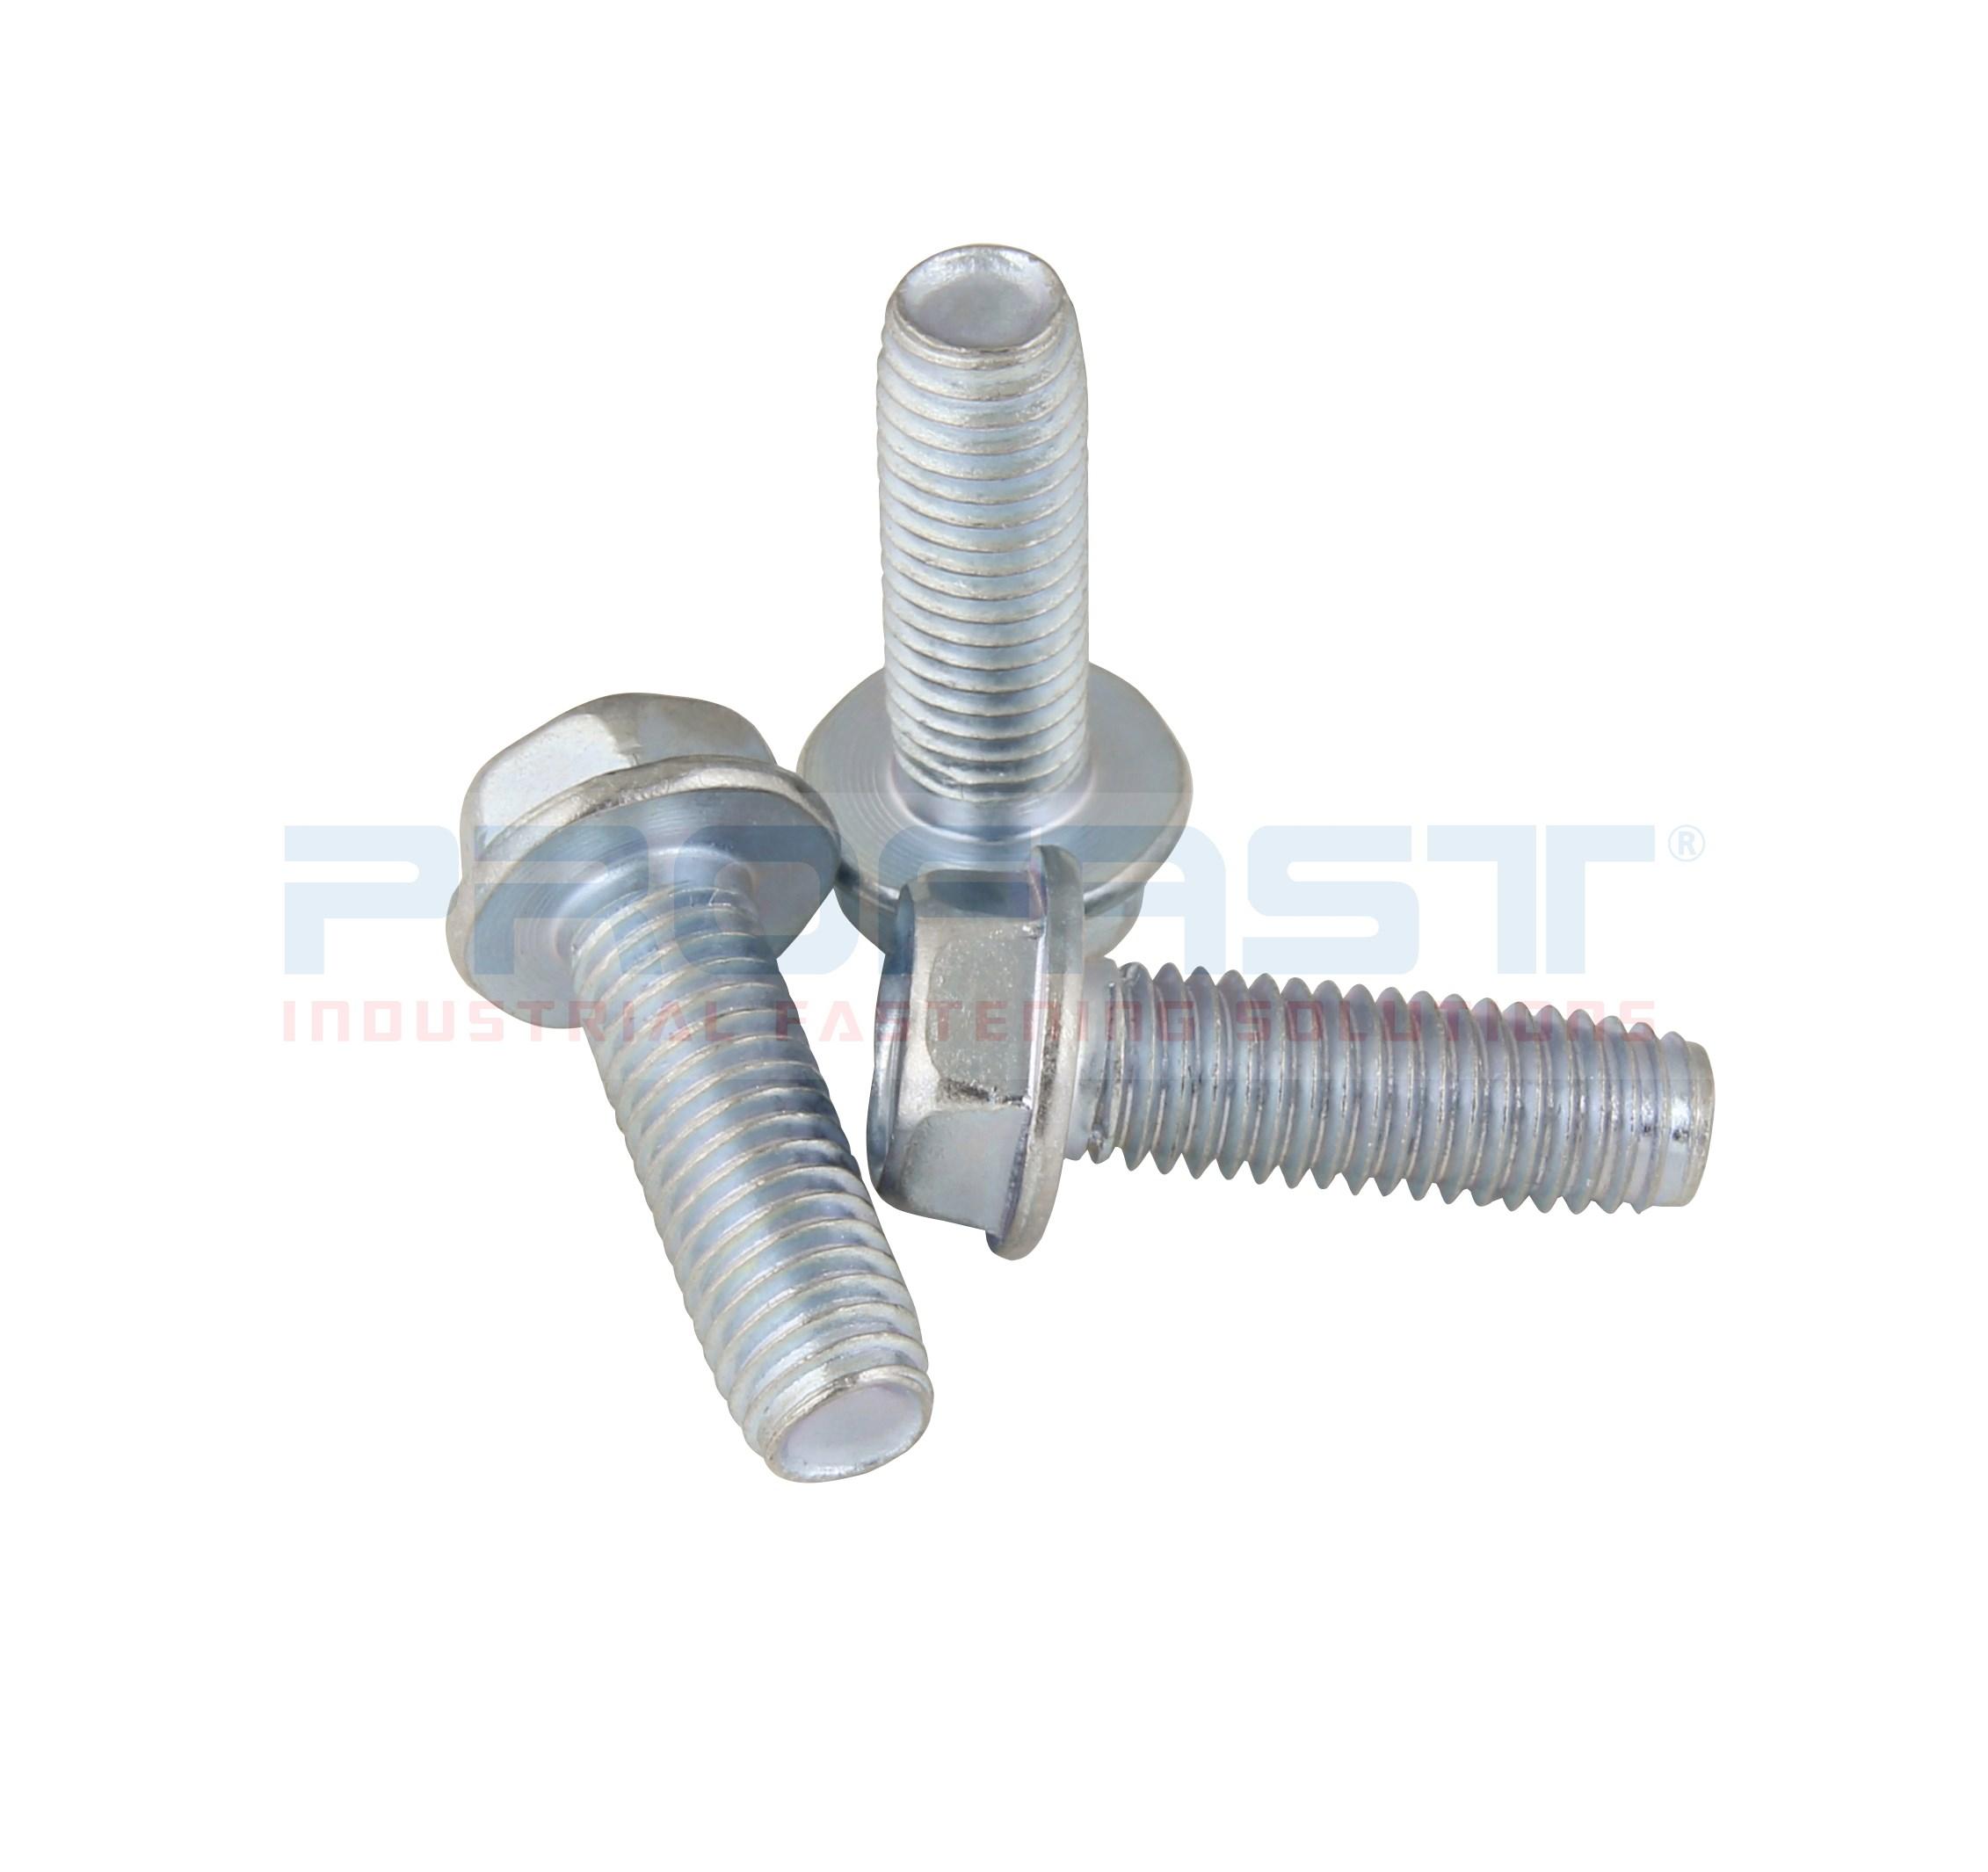 Thread rolling screw - Alternative to Taptite®